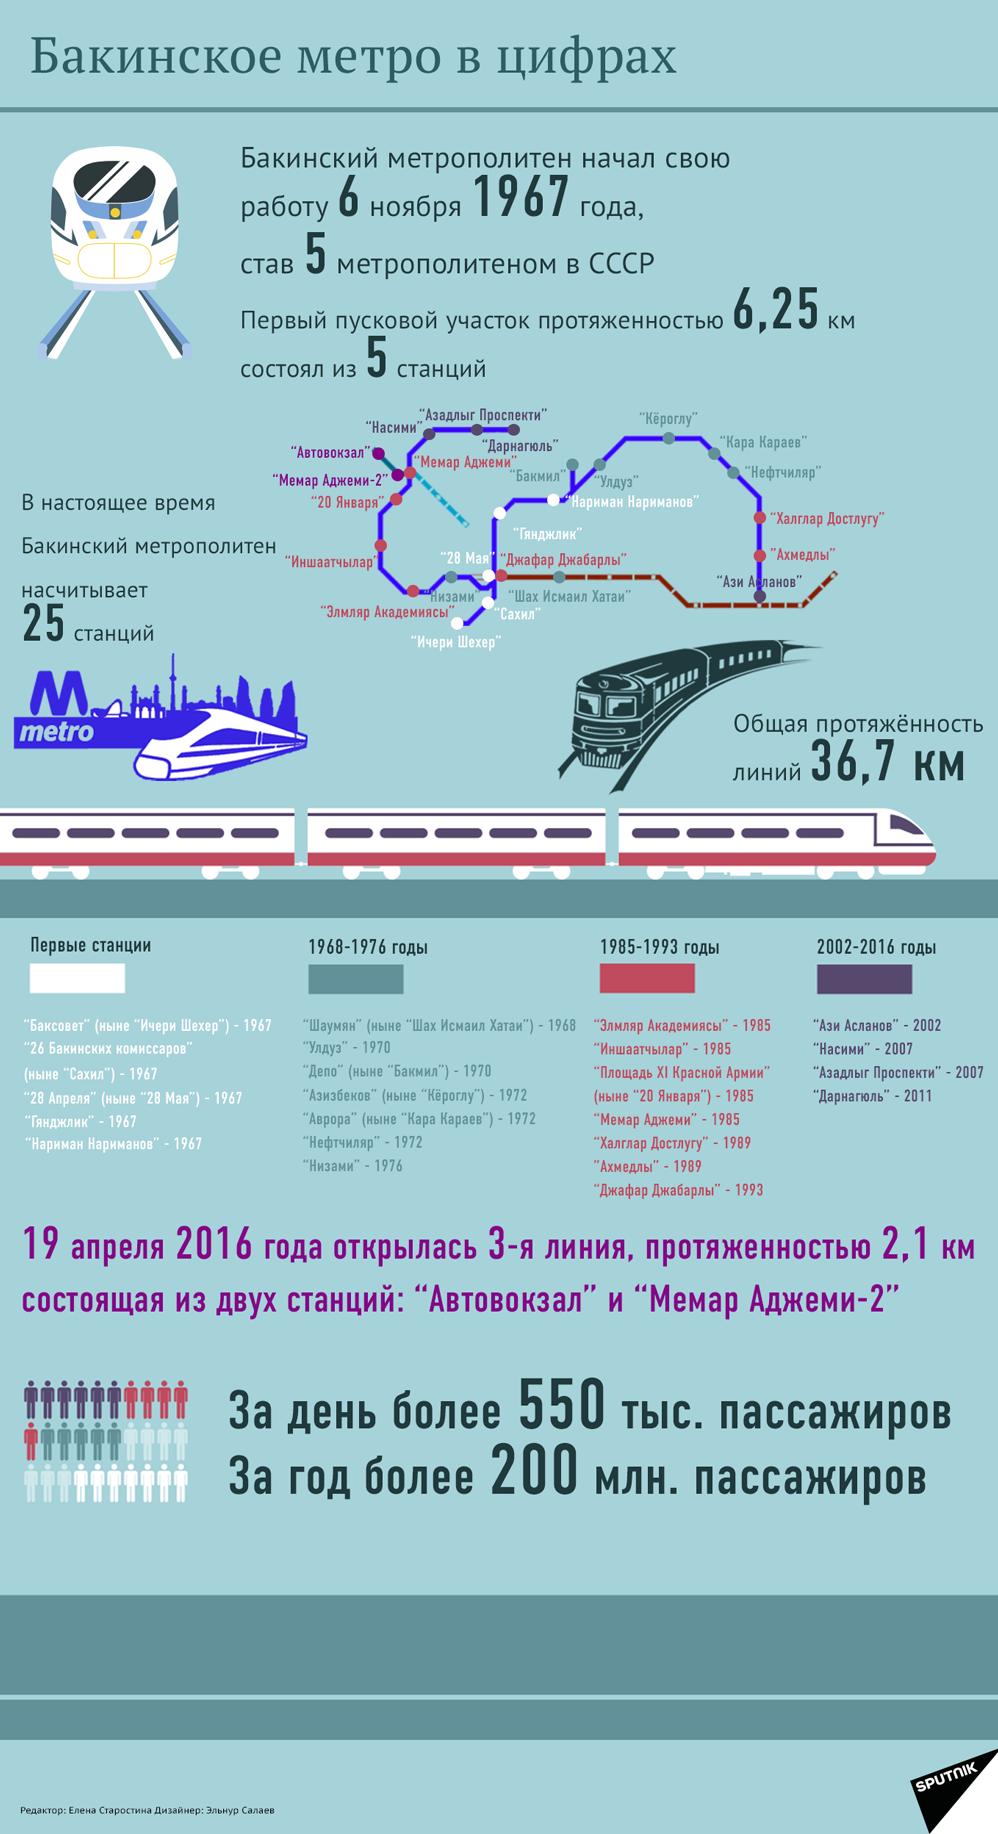 Бакинский метрополитен: цифры и факты - Sputnik Азербайджан